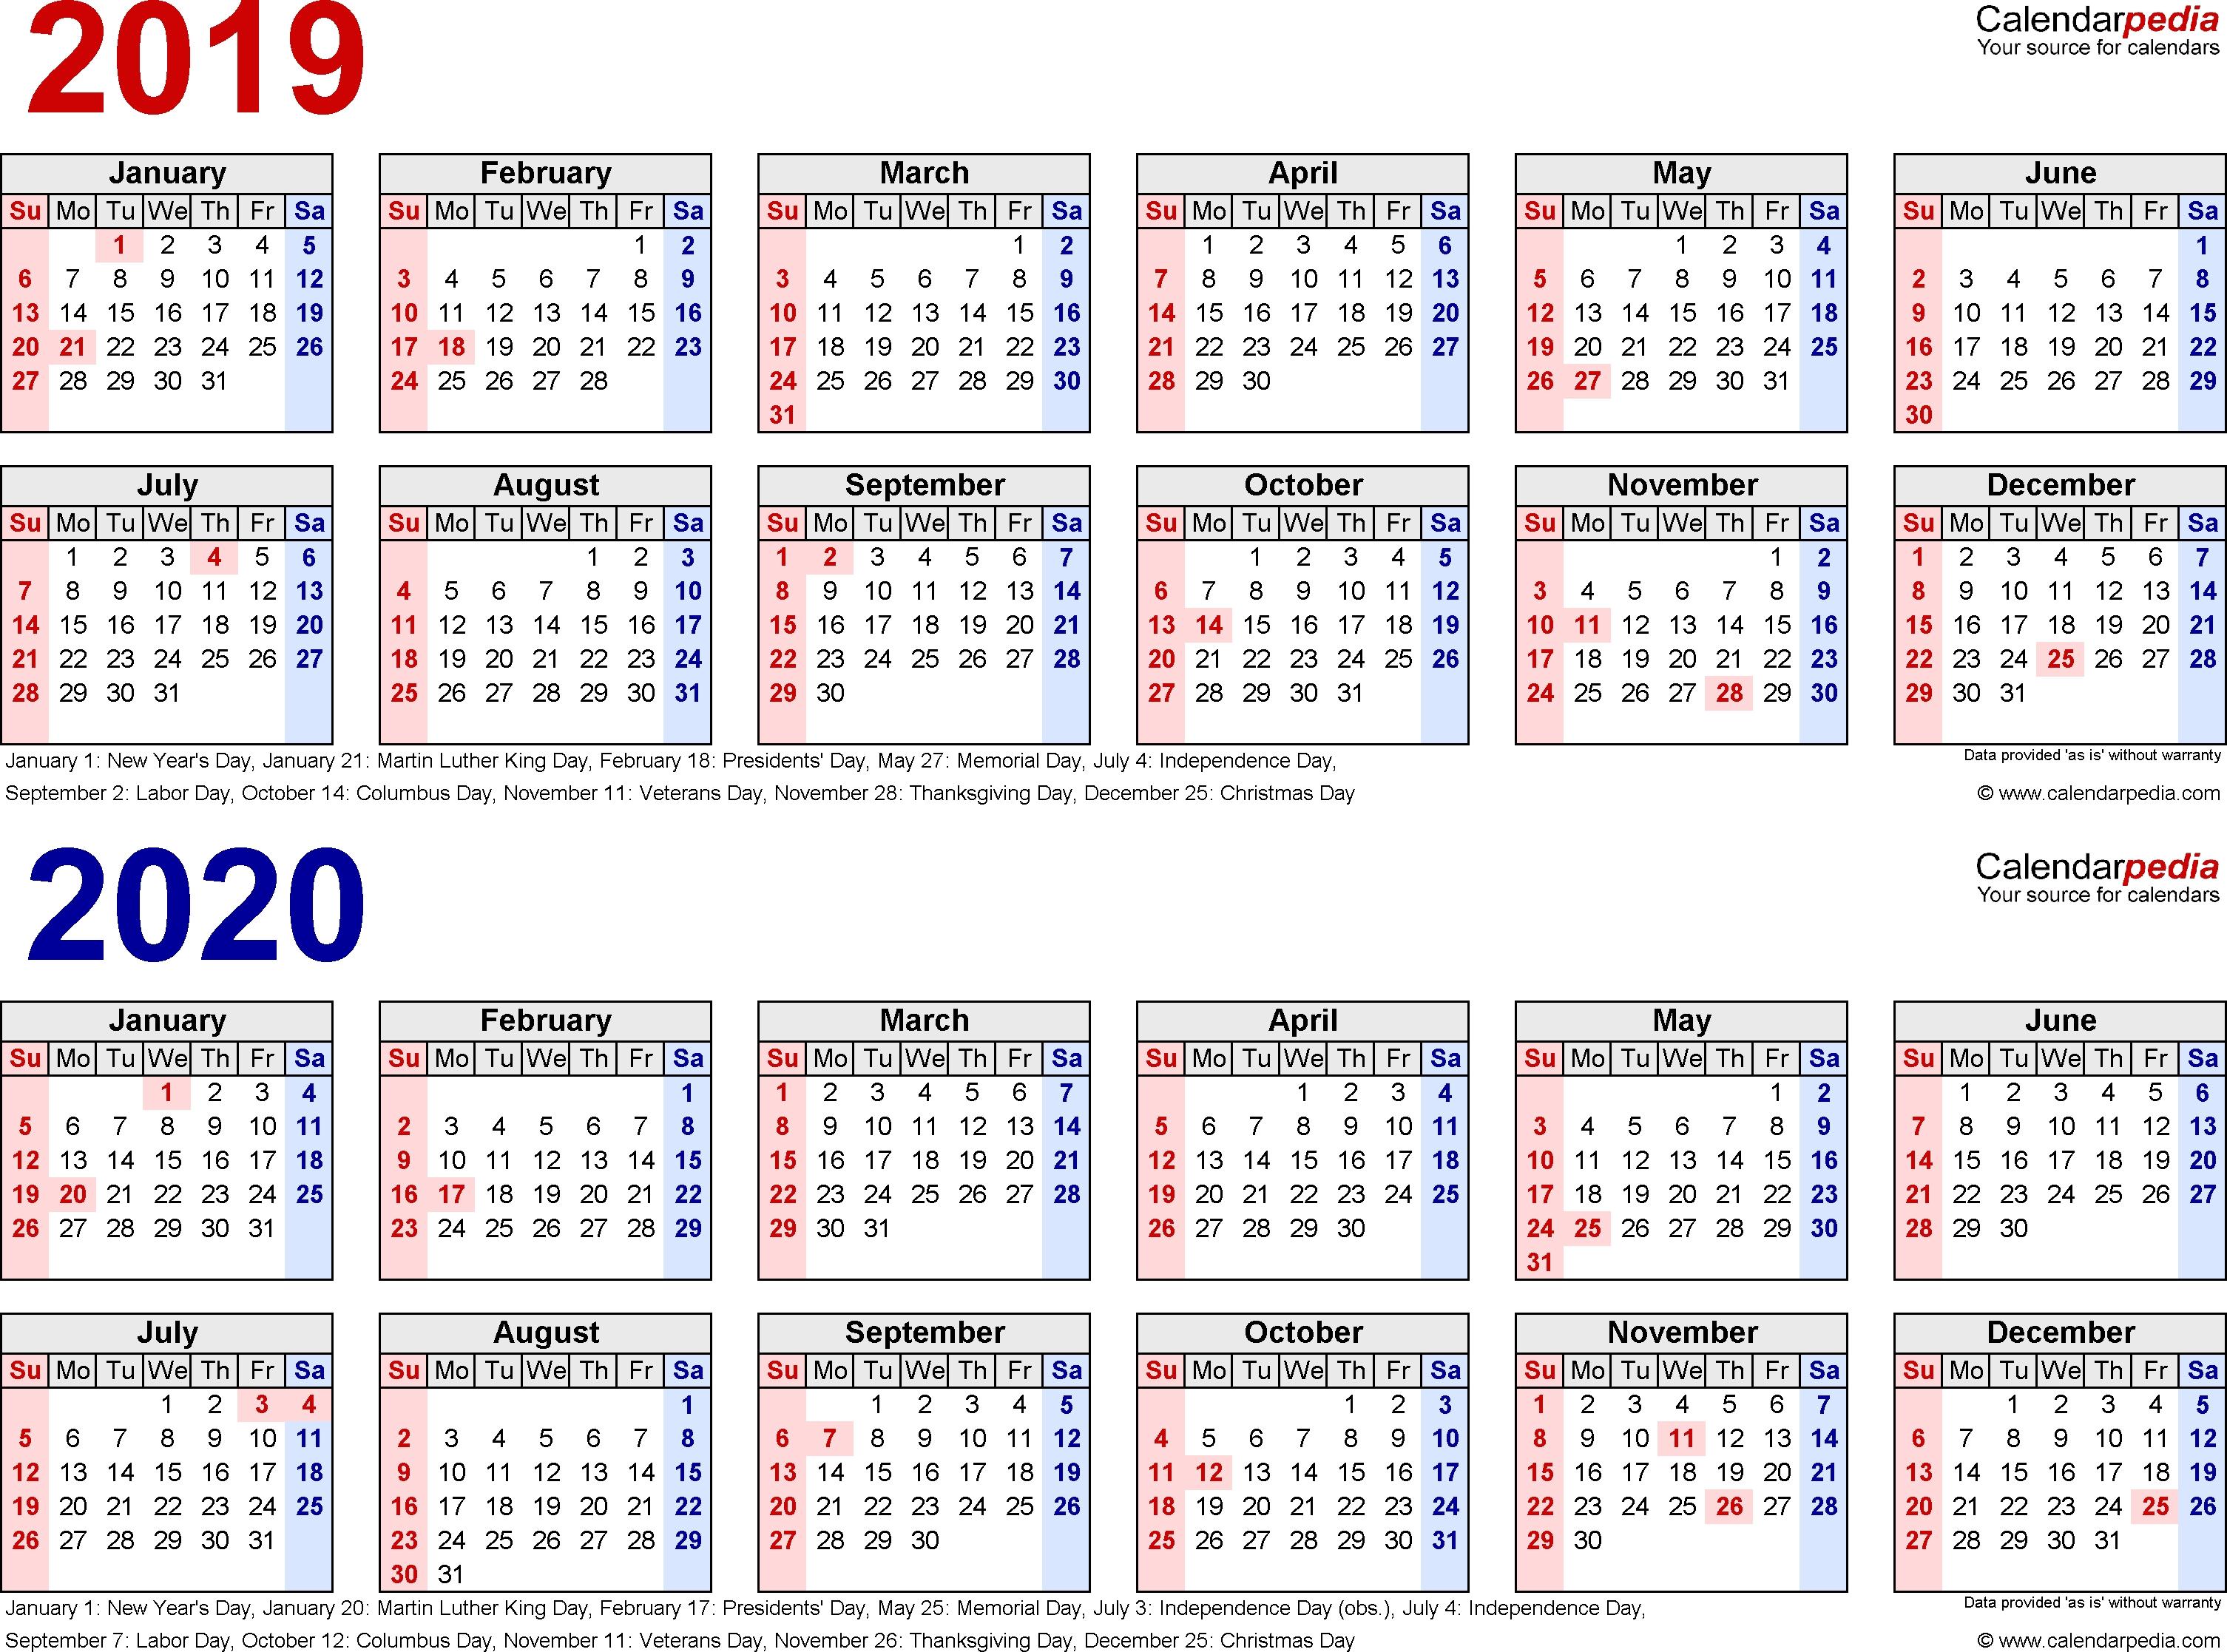 2019-2020 Calendar - Free Printable Two-Year Excel Calendars throughout 2020 Calendar With Week Numbers In Excel